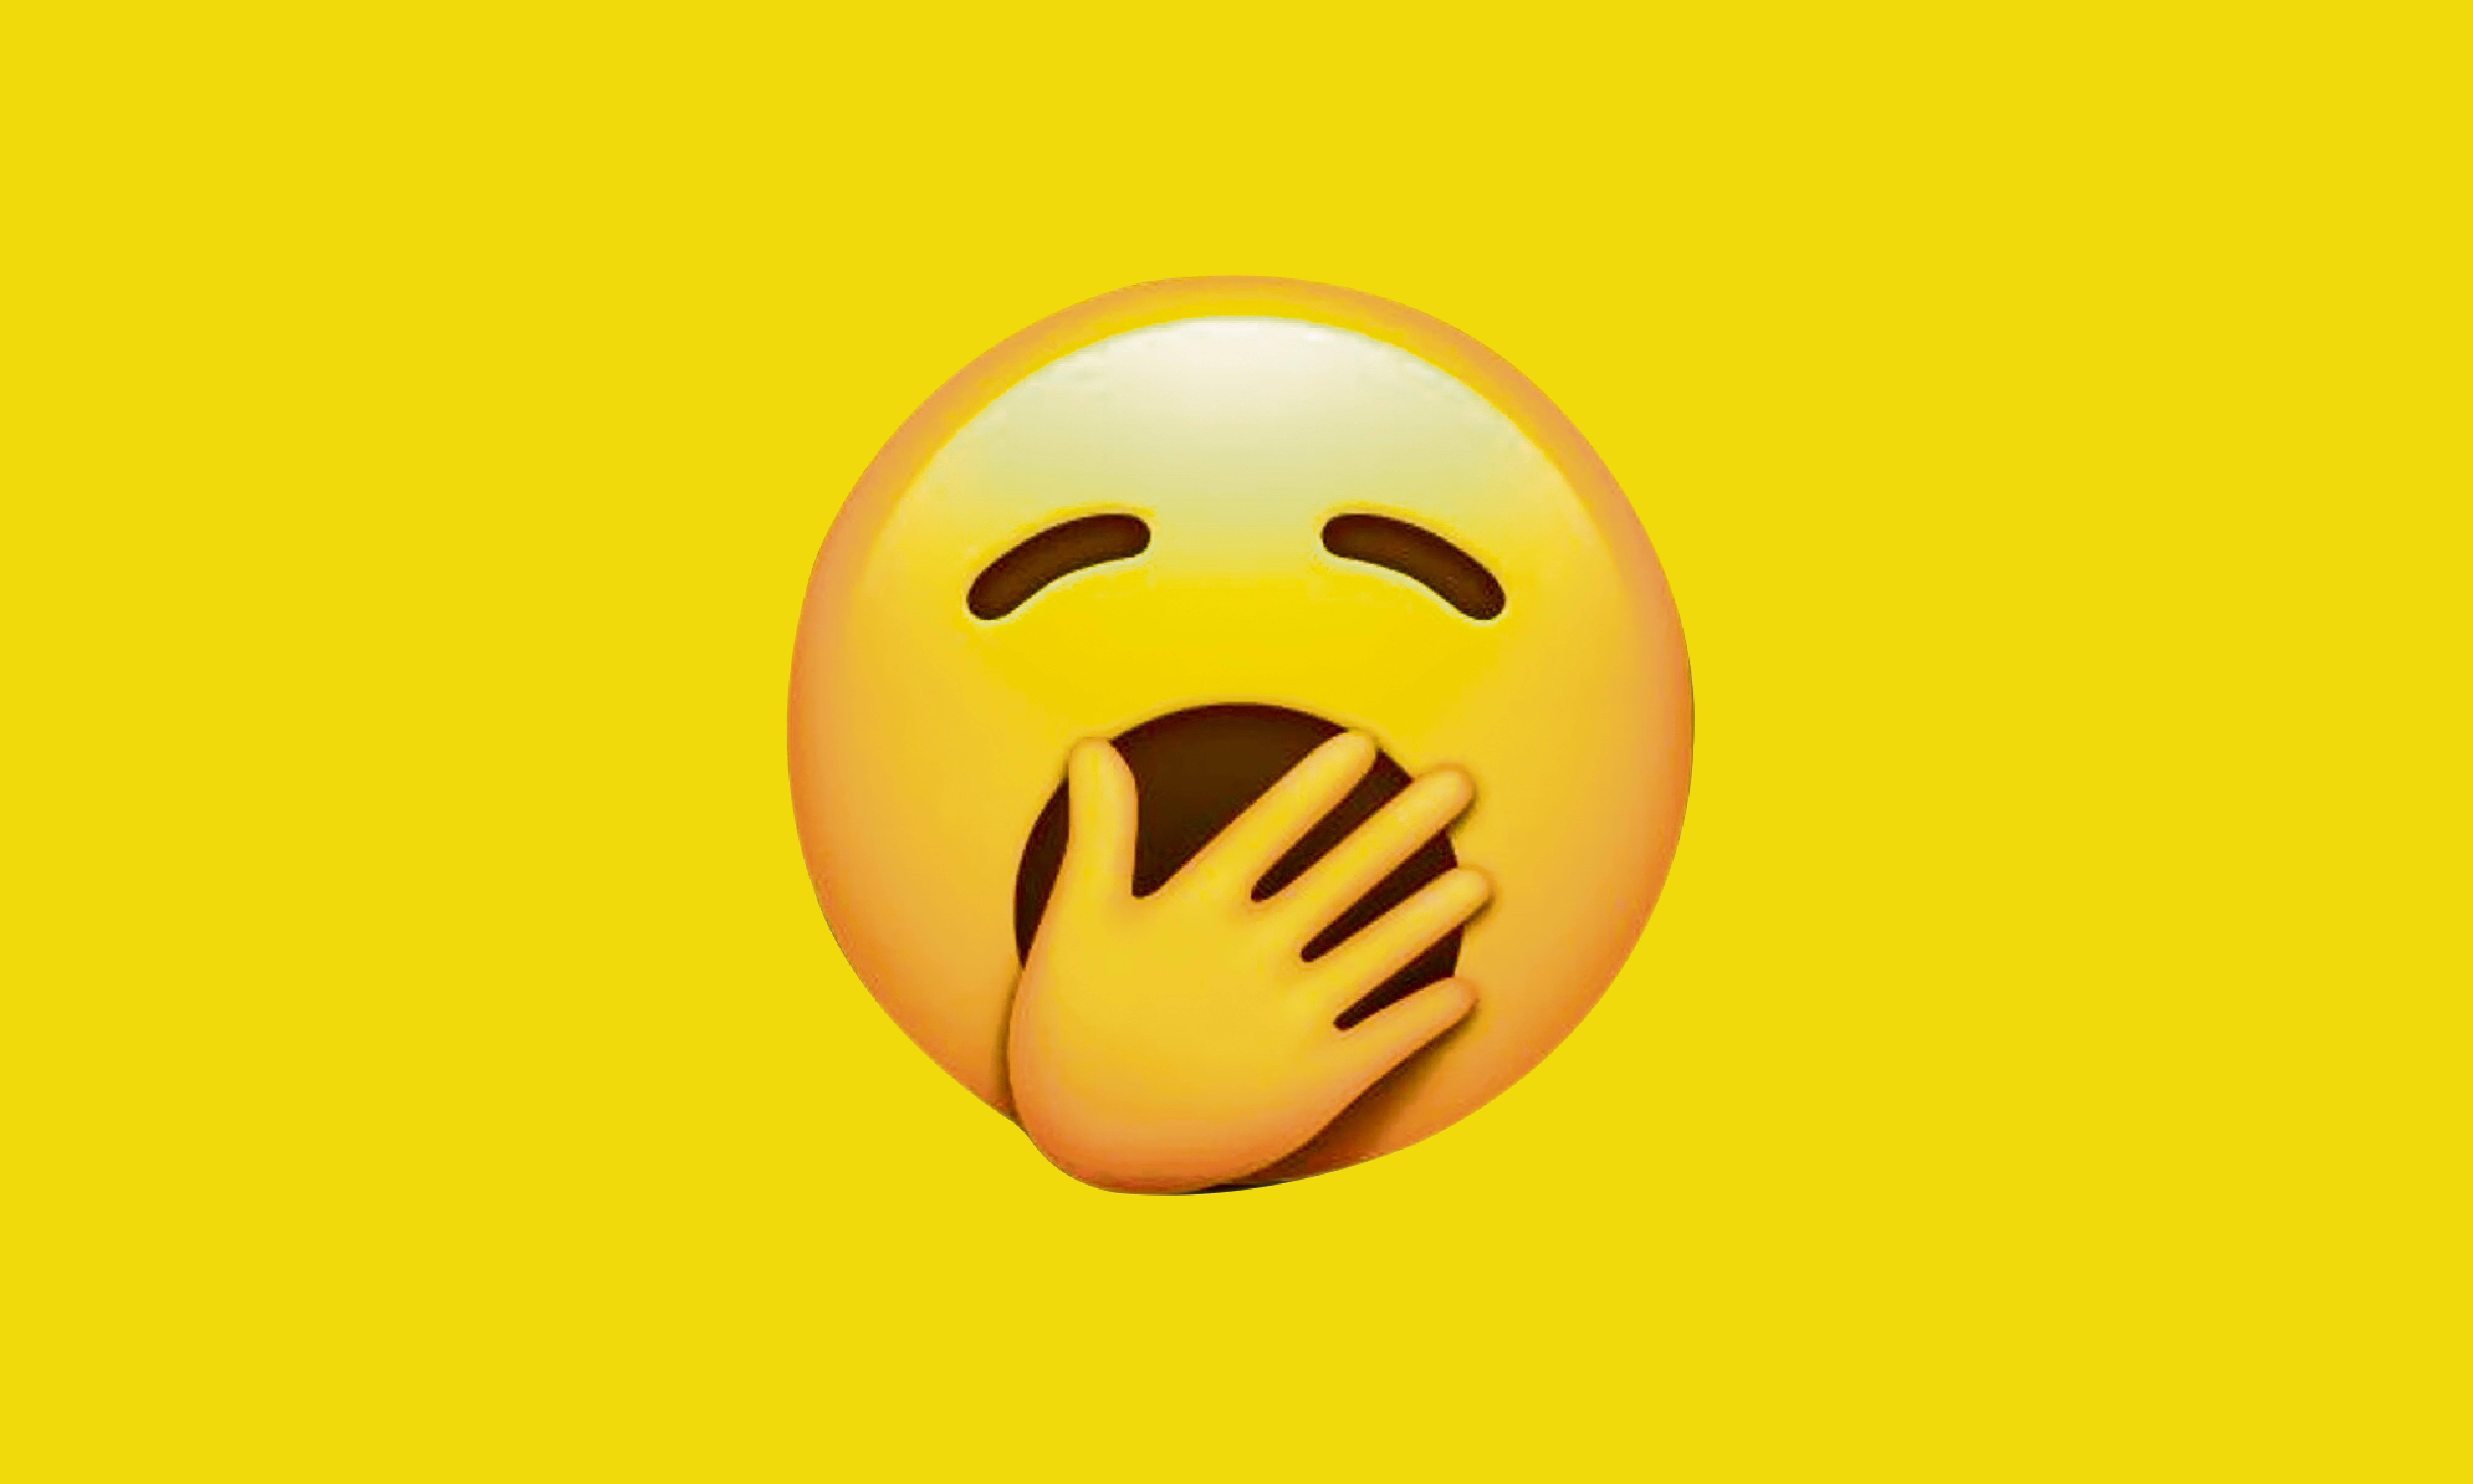 Yawning Face: finally, an emoji that embodies life in 2019